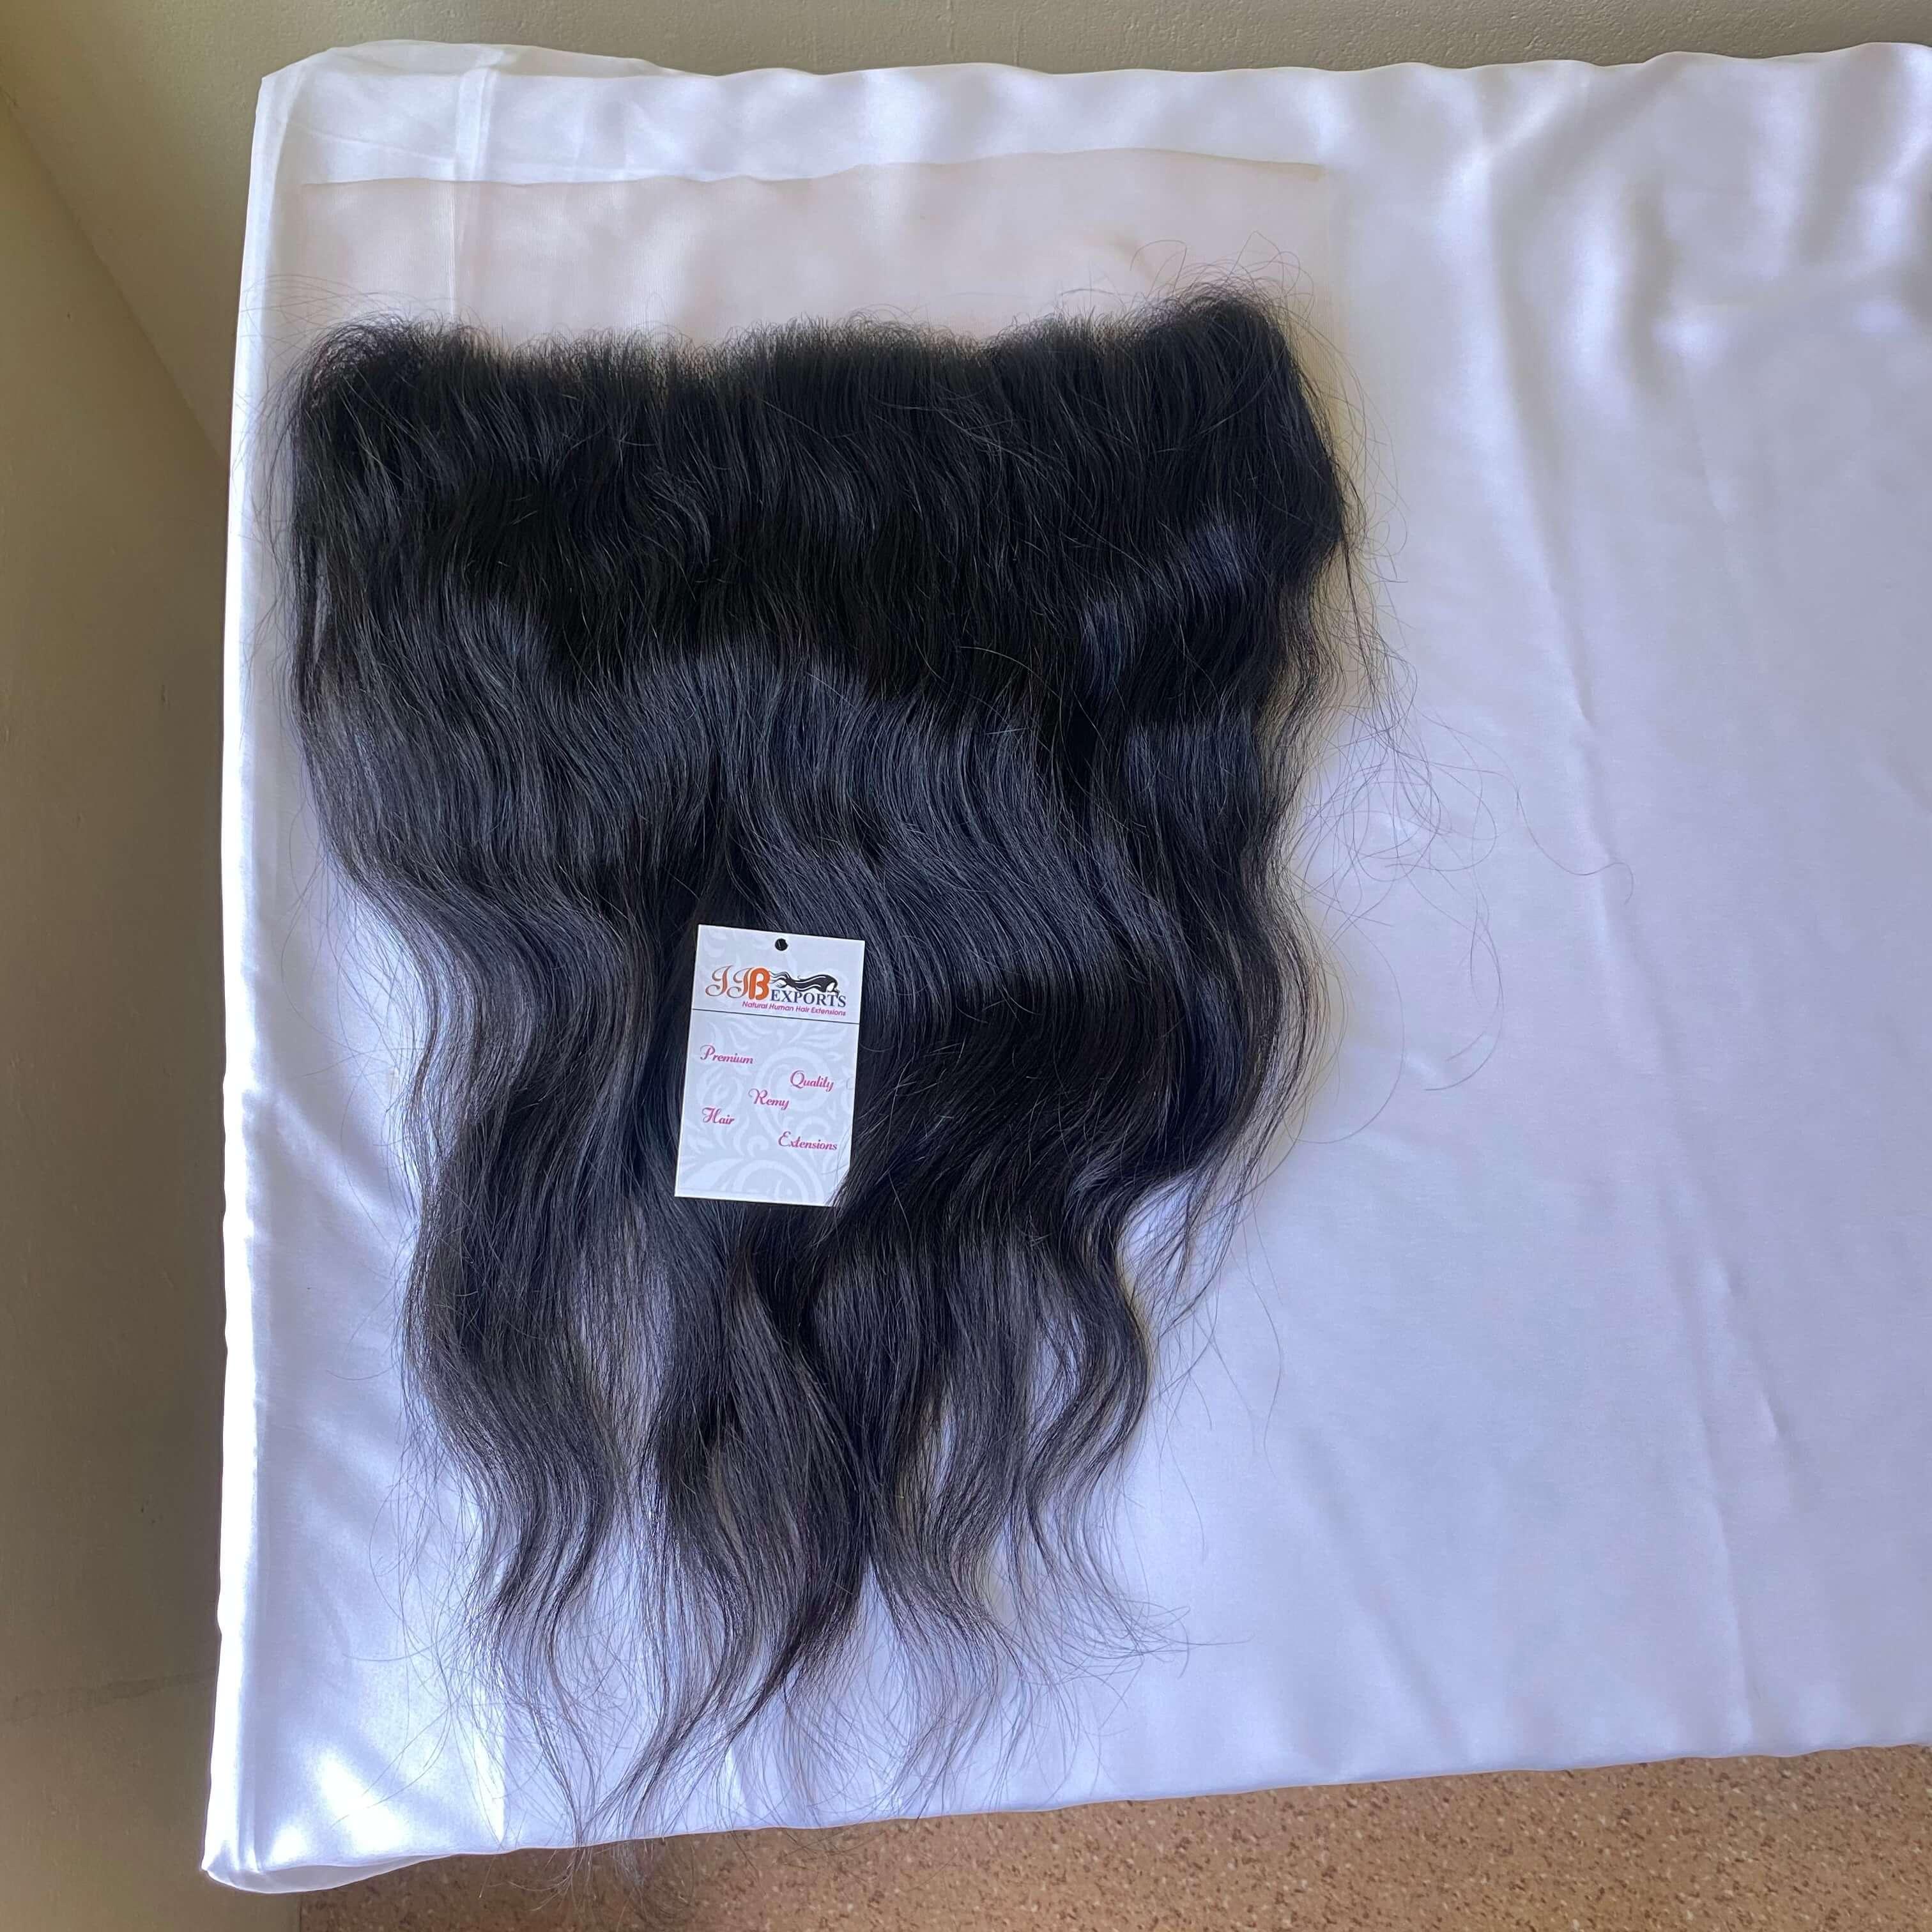 Peruvian Natural Body Wave/wavy Human Hair Thin Lace Frontal 13x4 Hair Extensions